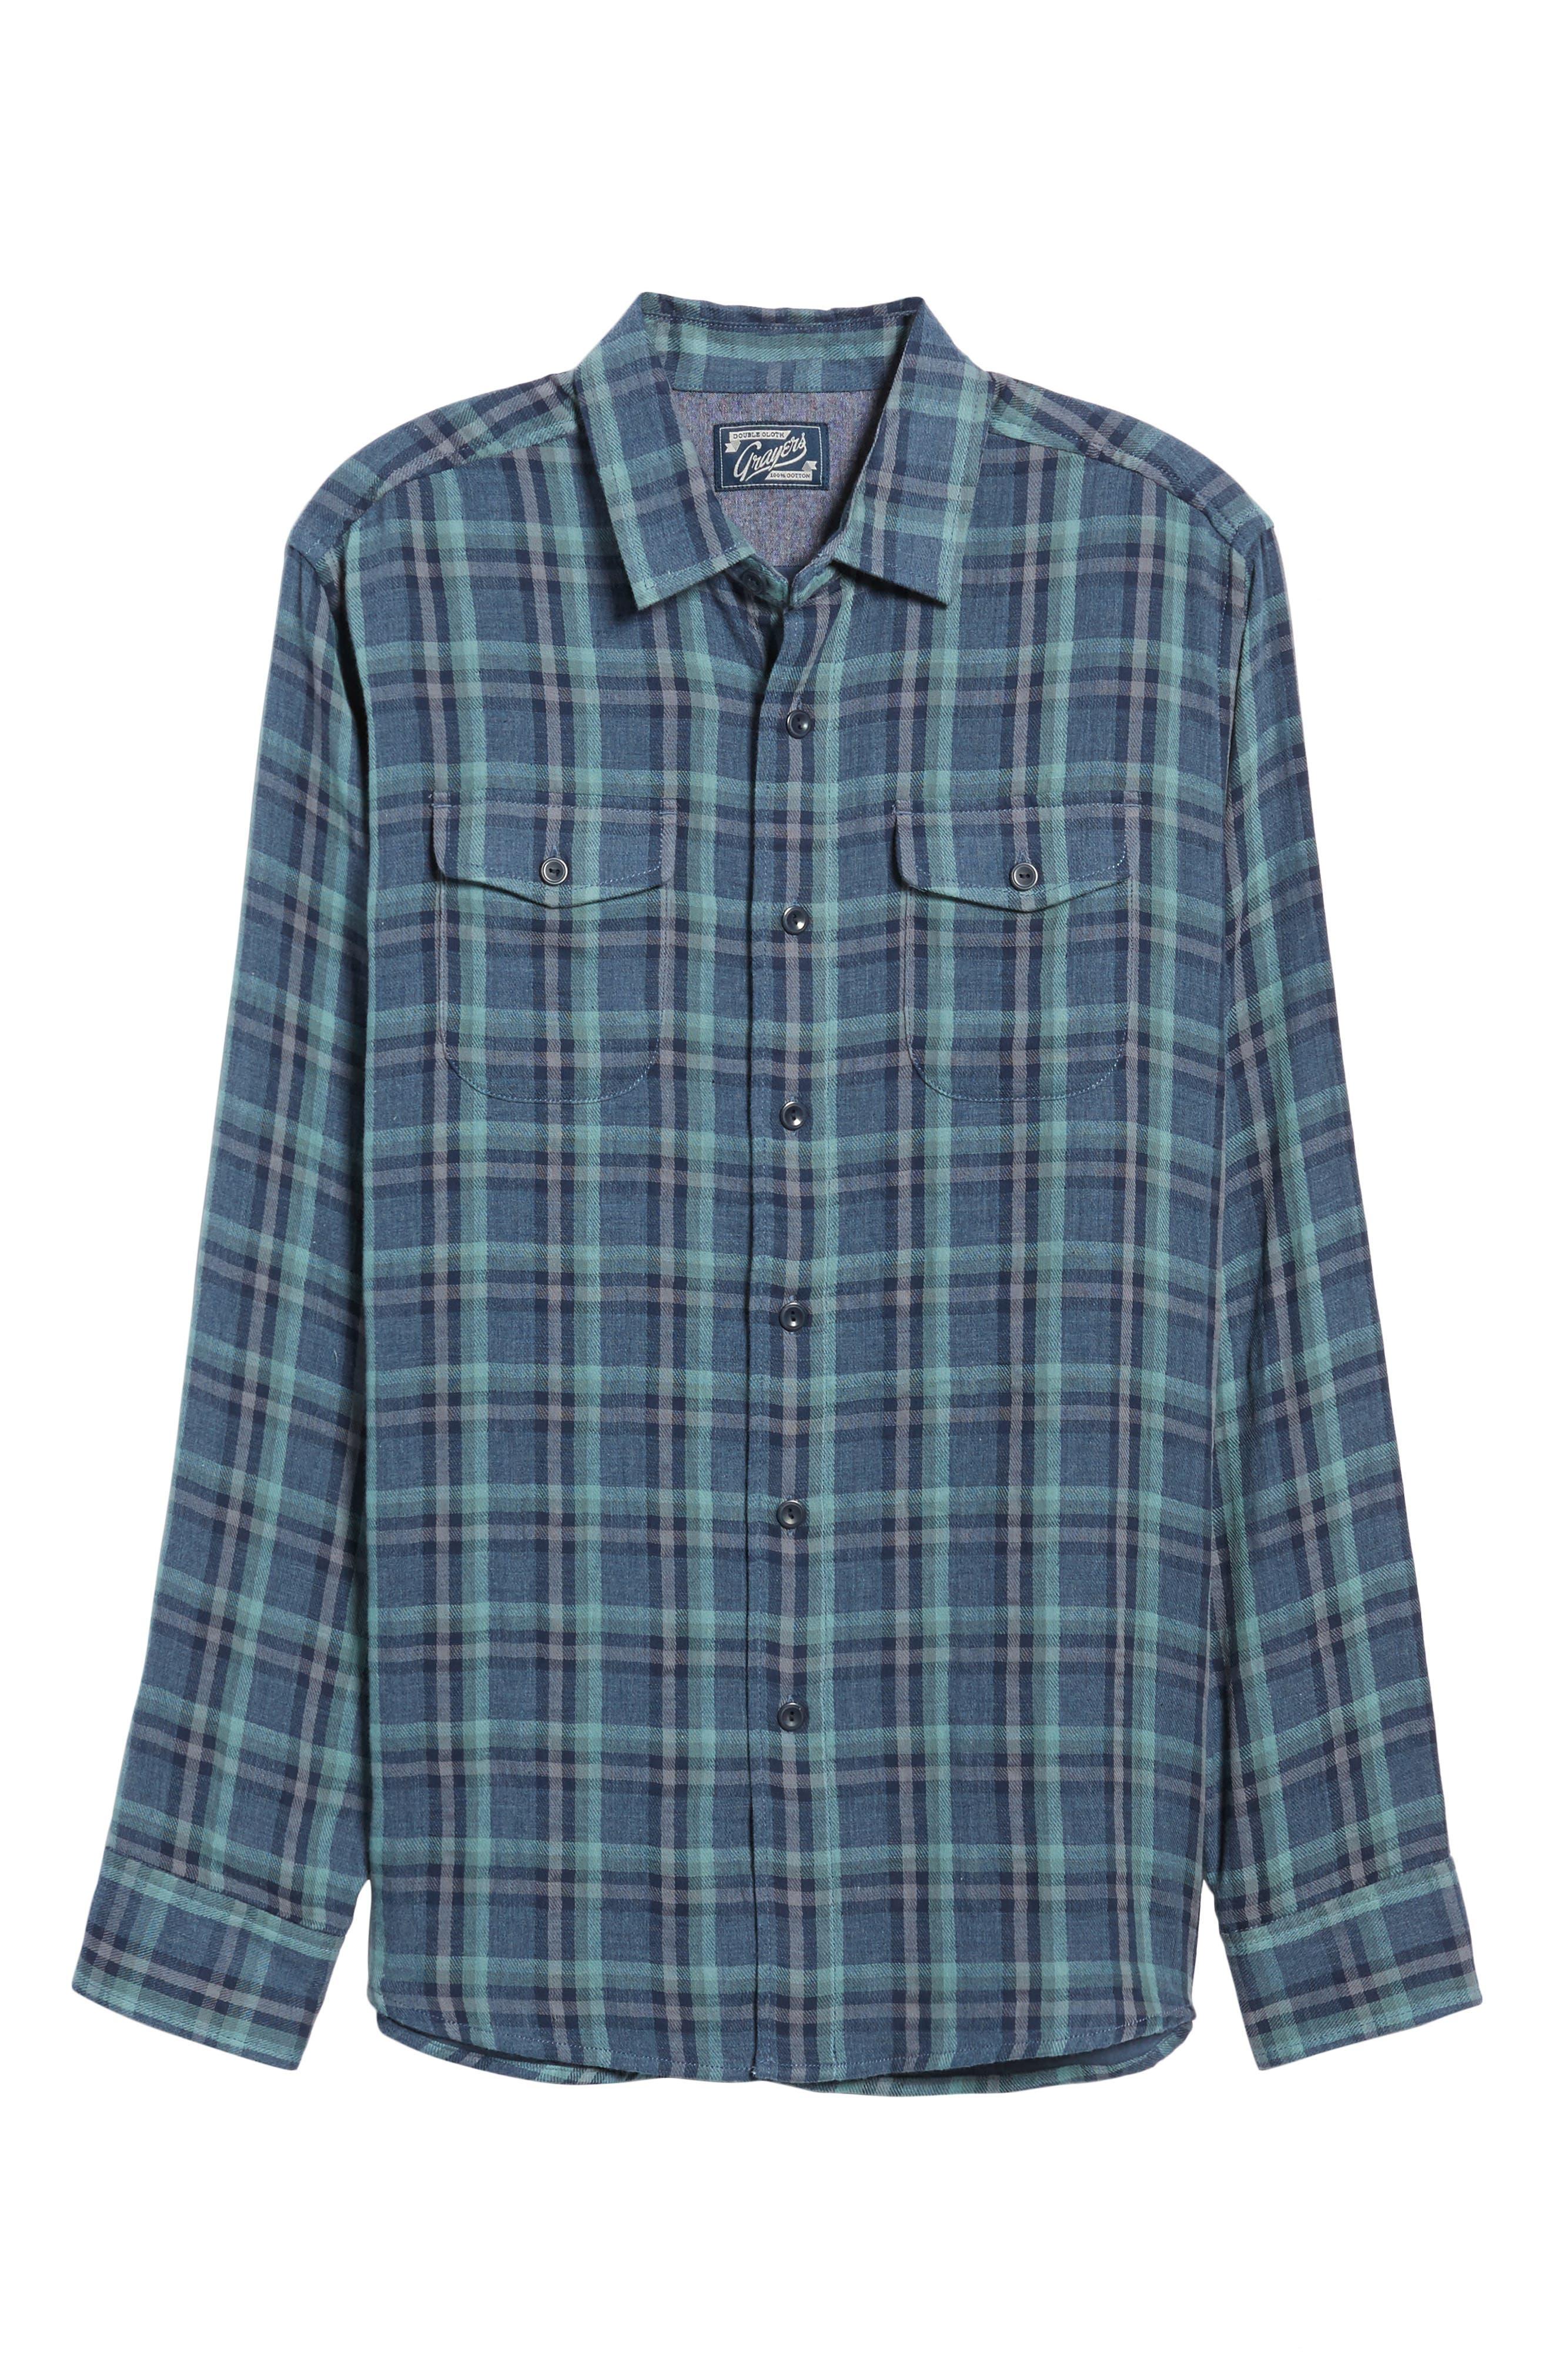 Smith Double Cloth Plaid Sport Shirt,                             Alternate thumbnail 6, color,                             Blue Navy Seafoam